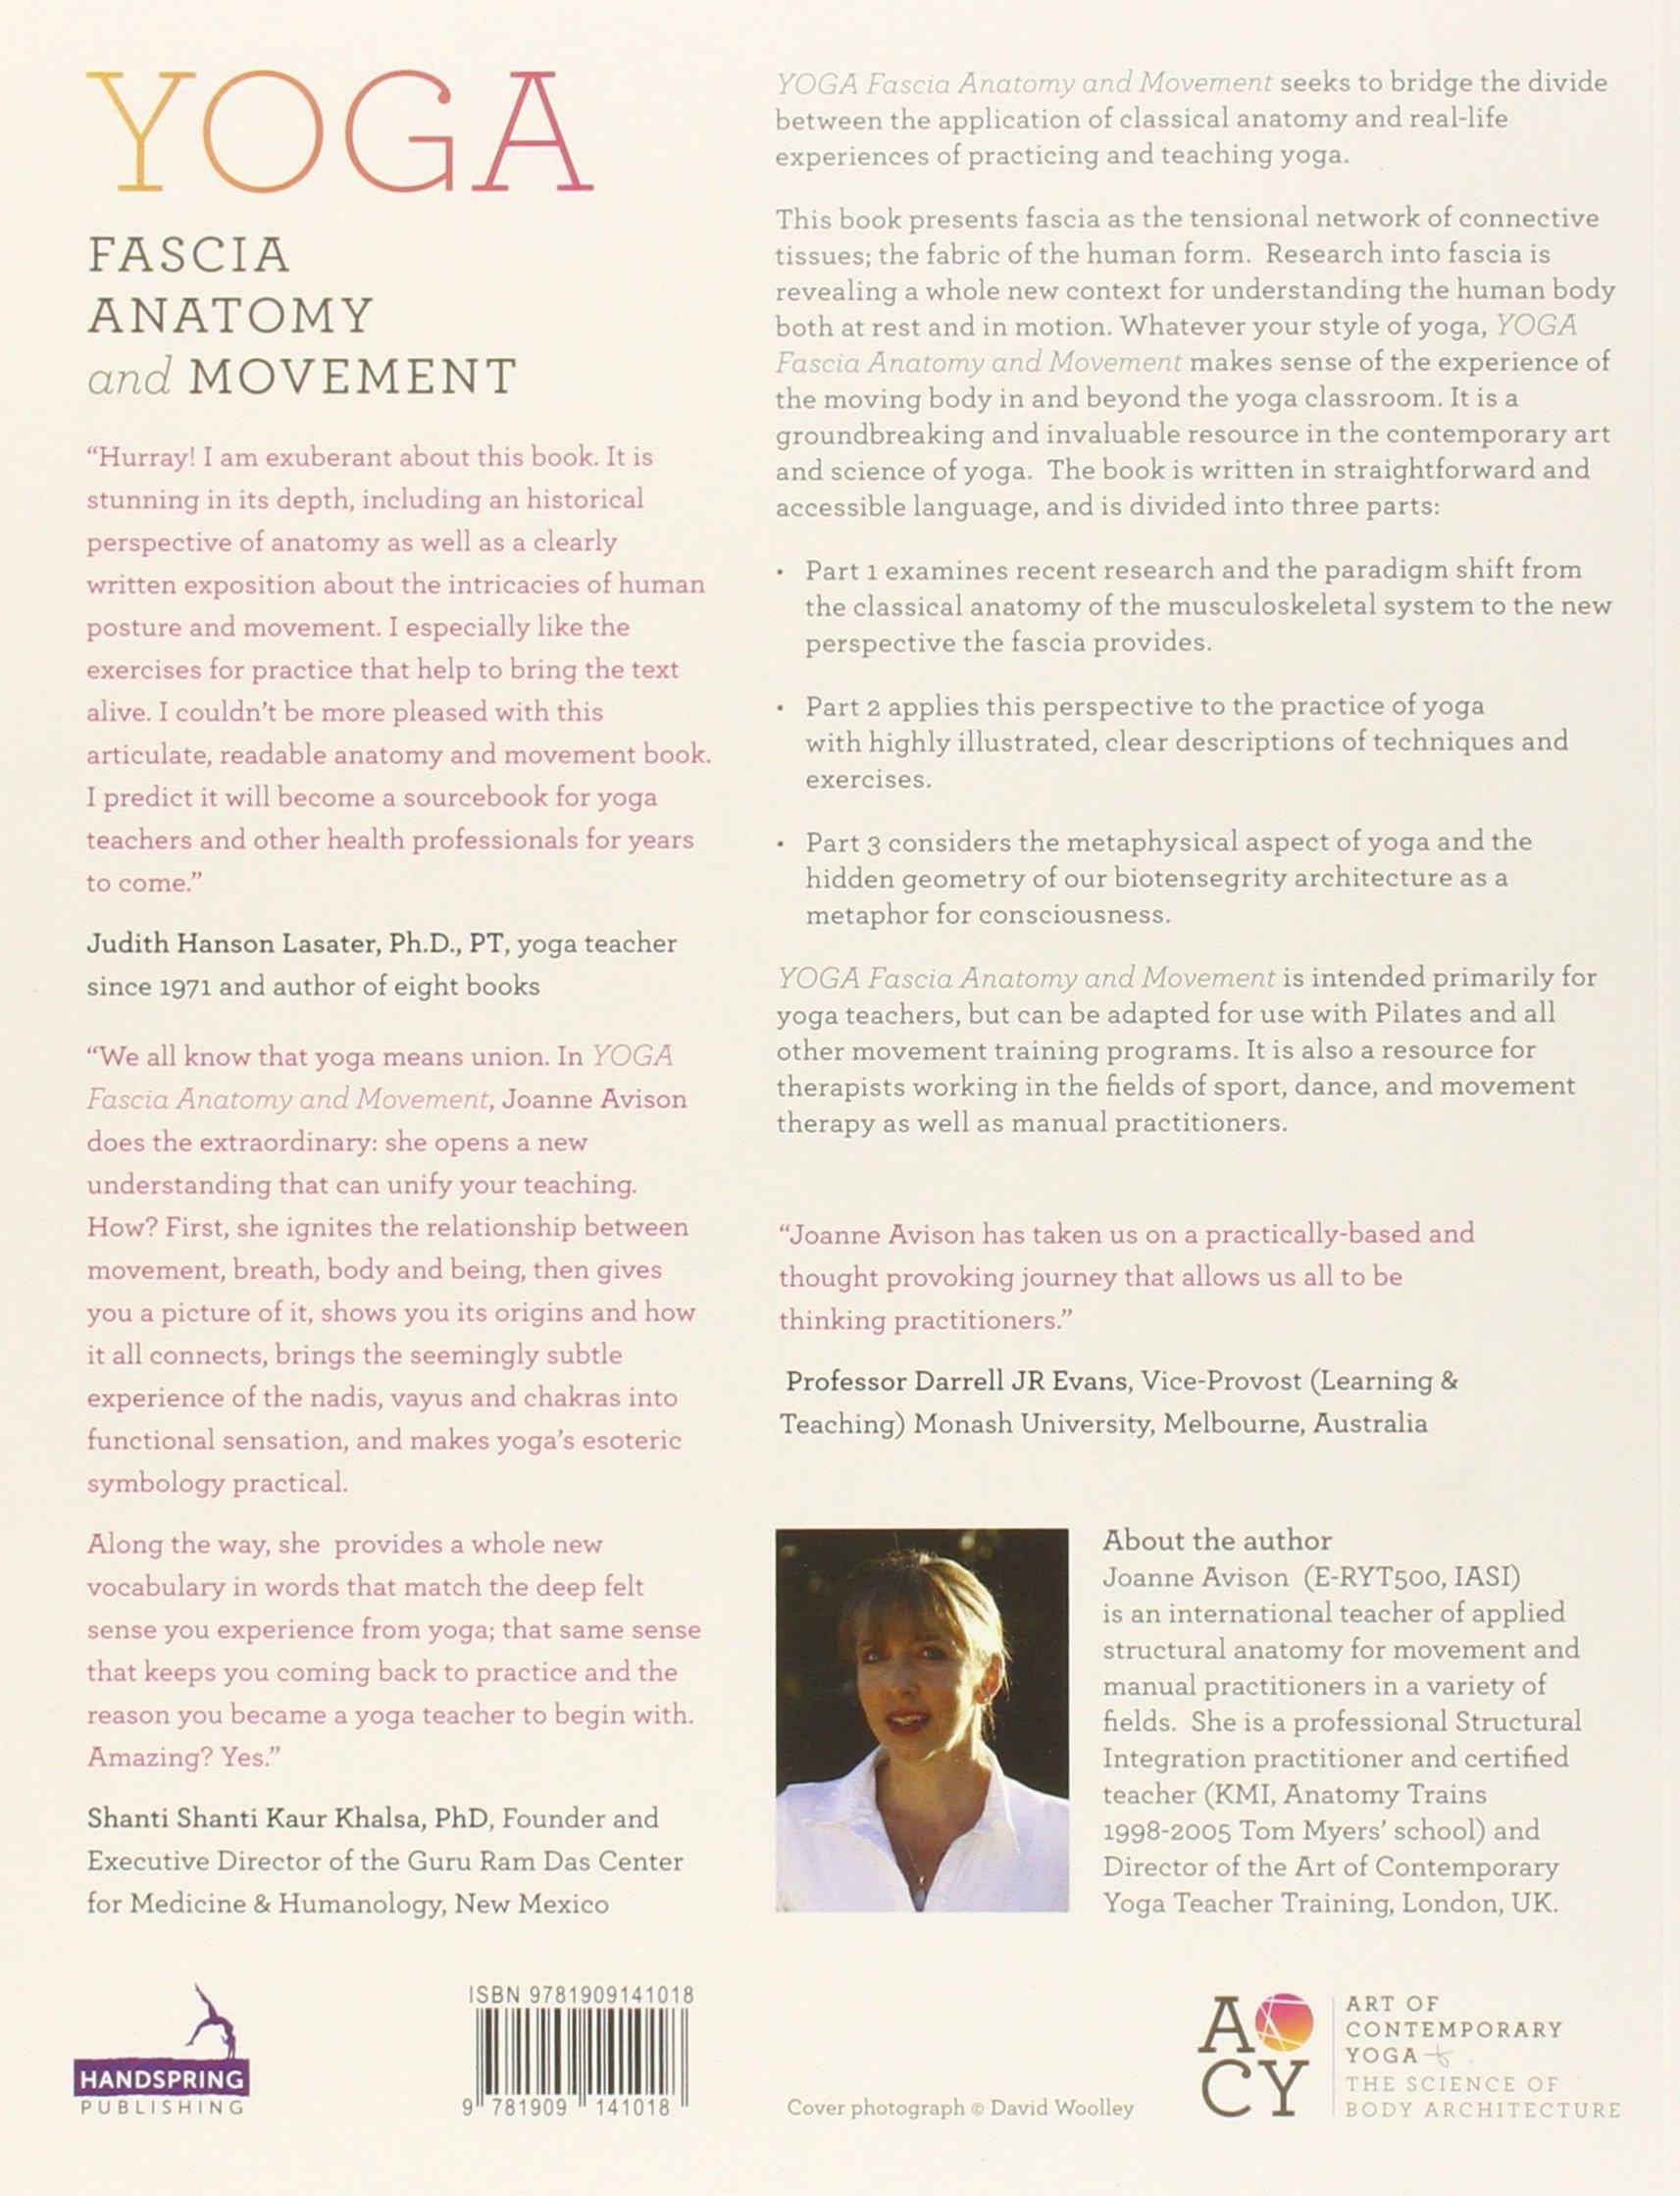 Yoga: Fascia, Anatomy and Movement: Amazon.co.uk: J. Avison: Books